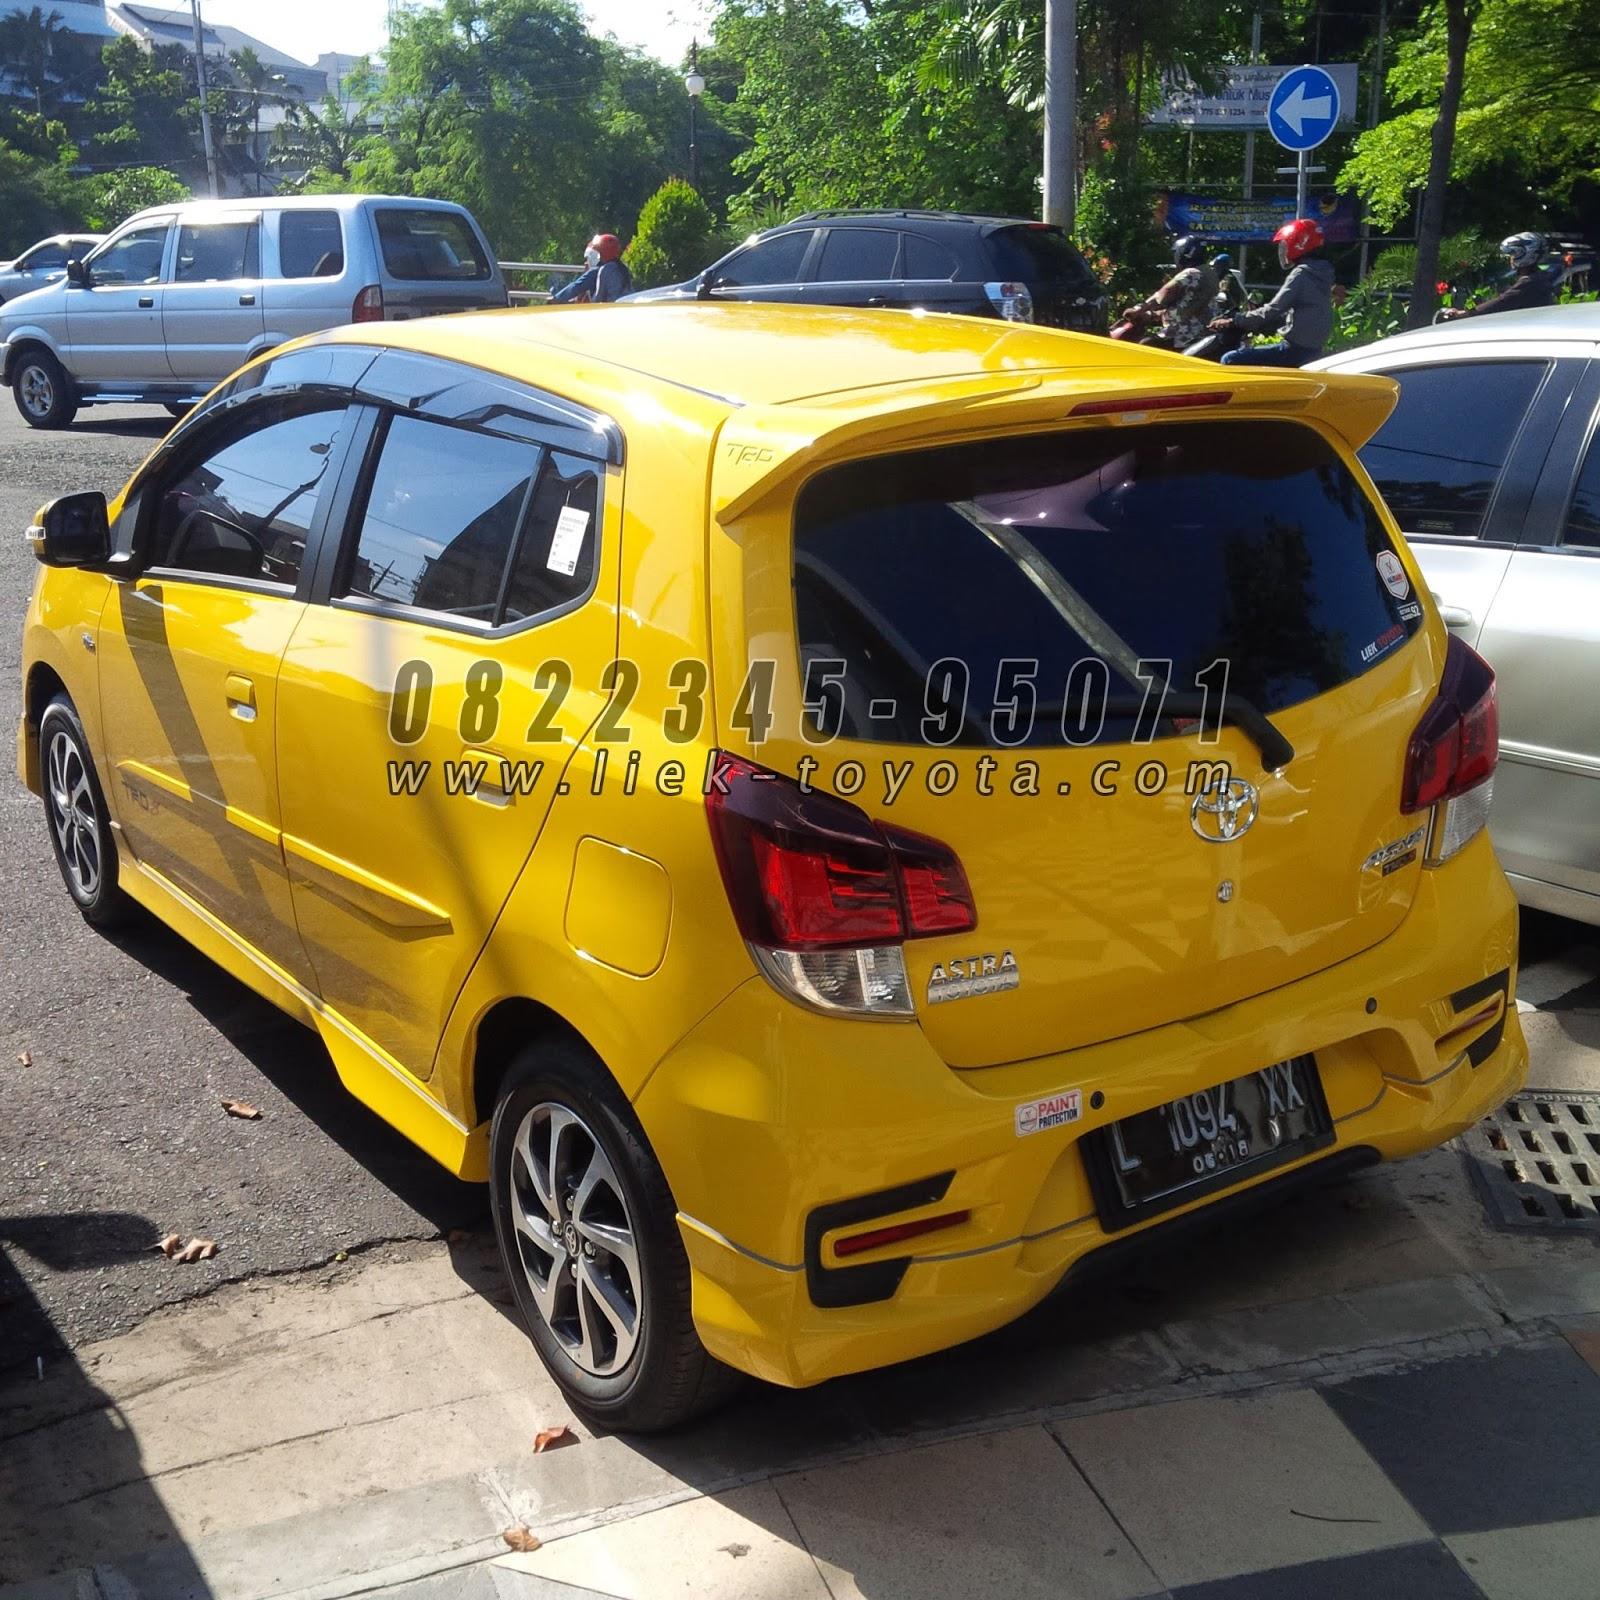 Warna New Agya Trd Spesifikasi Grand Avanza Tipe E Harga Toyota G Kuning Liek Manual 2017 Foto Belakang